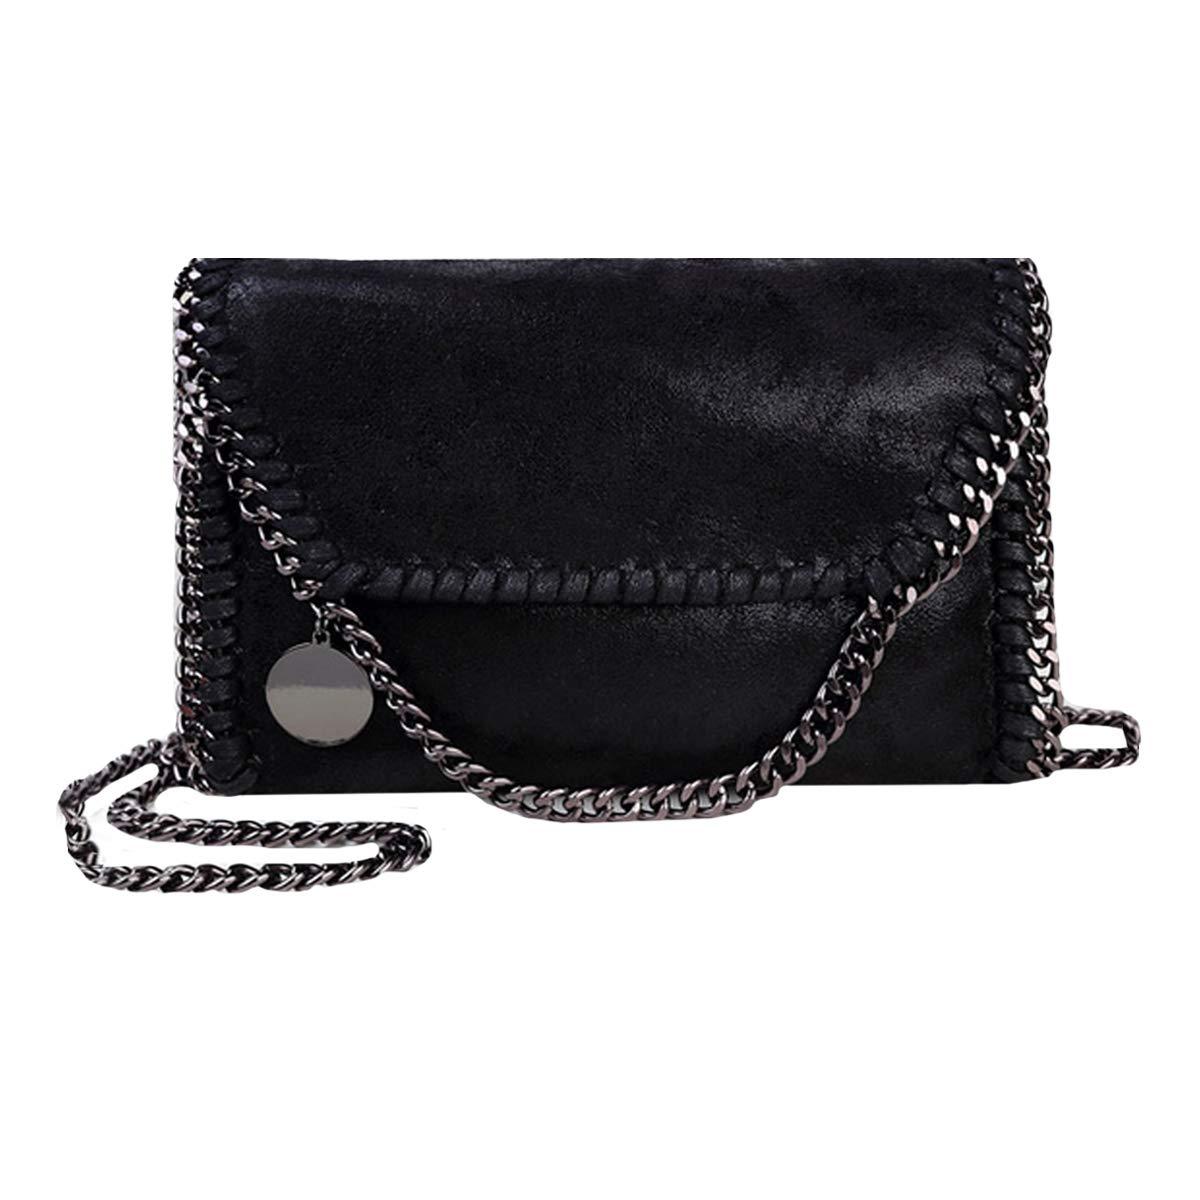 f058c717975b Heidi Bag Women Crossbody Chain Bag PU Leather Shoulder Handbags ...